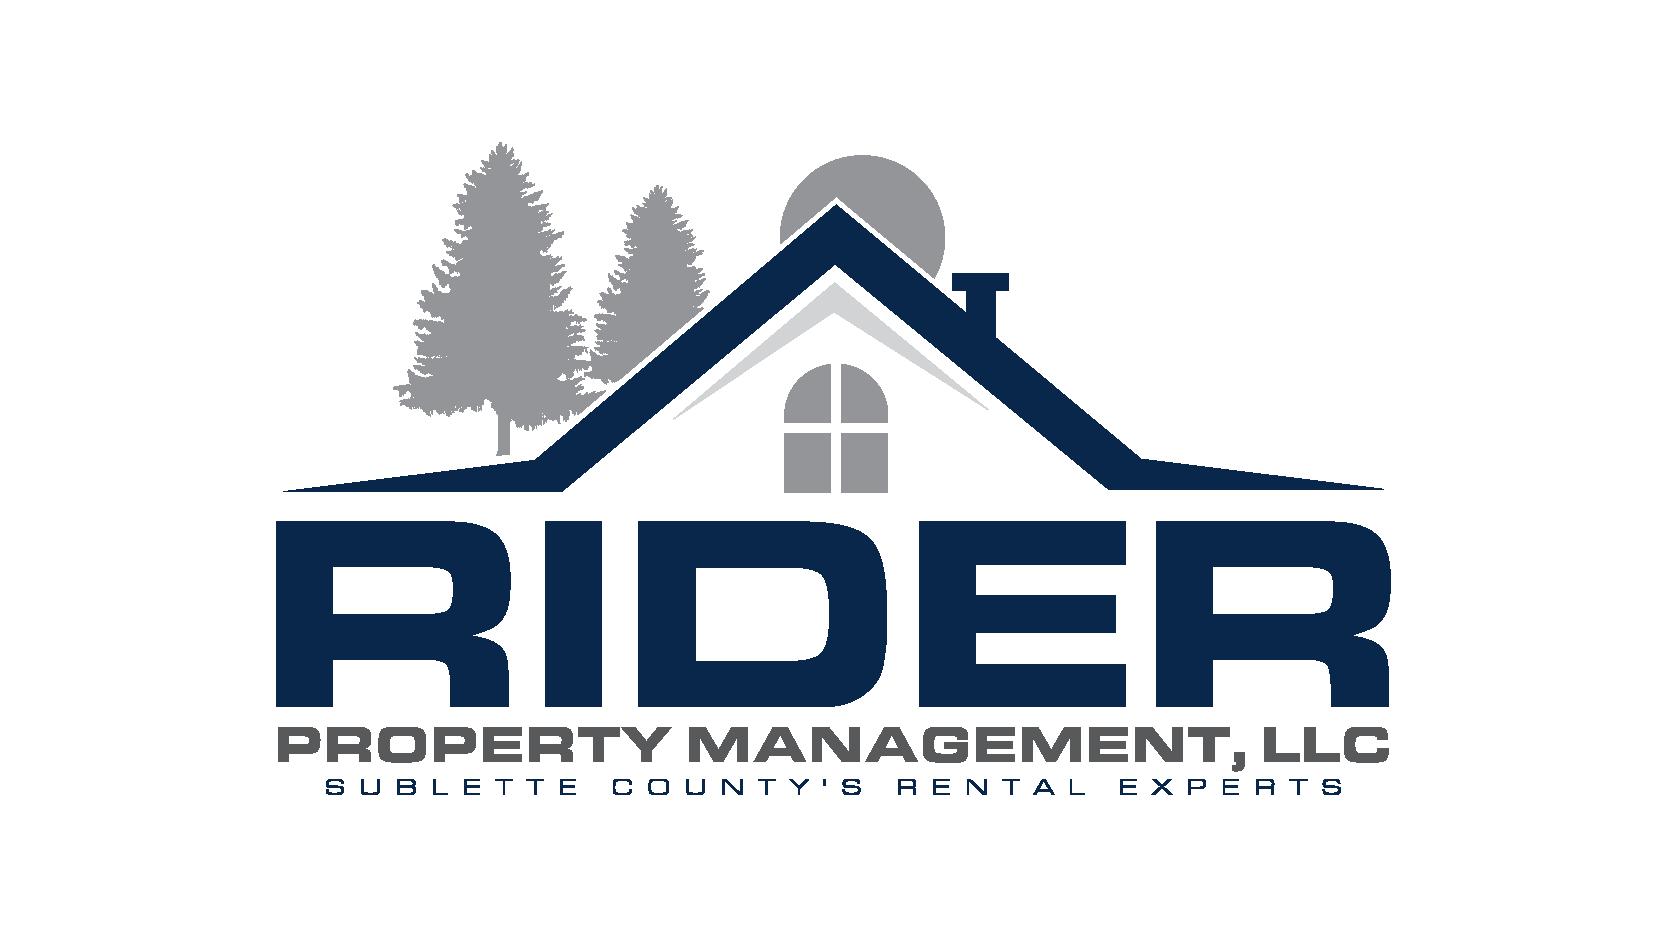 MS_LS_Rider Property Management, LLC_2ndrev_FinalFIles-01